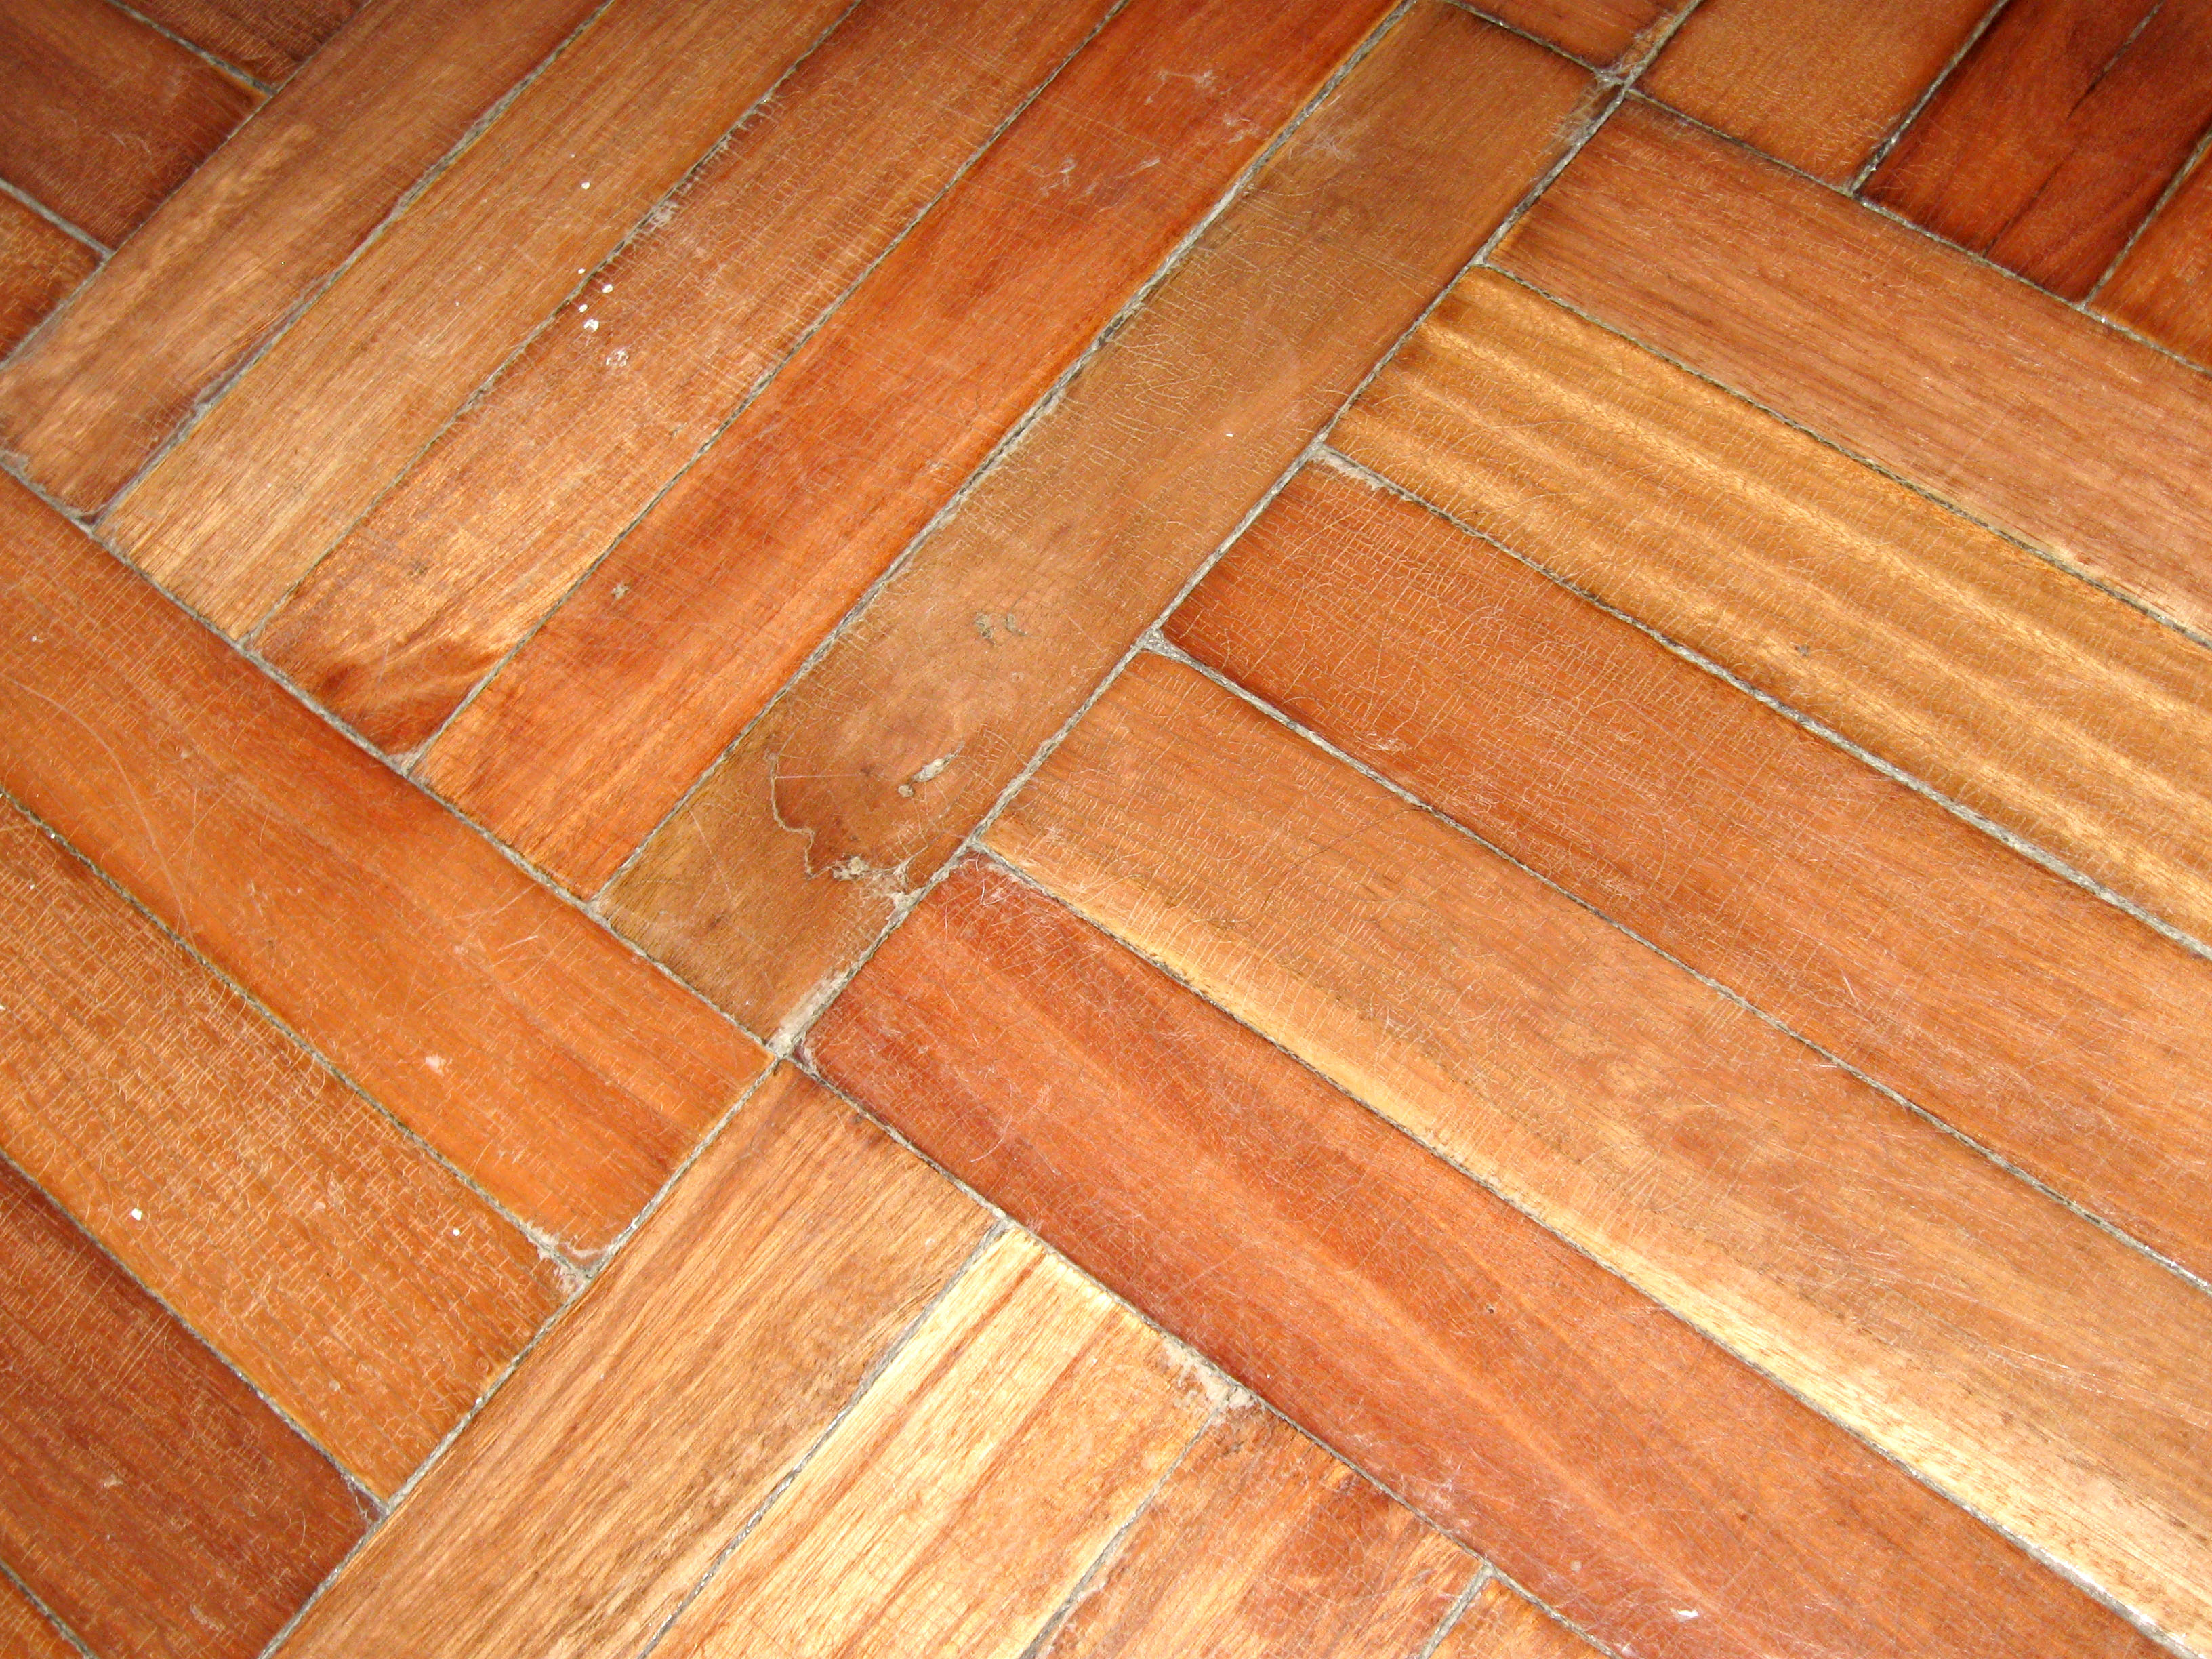 Parquet flooring lowes chicago wood floor 96th in chico for Hardwood floors phoenix